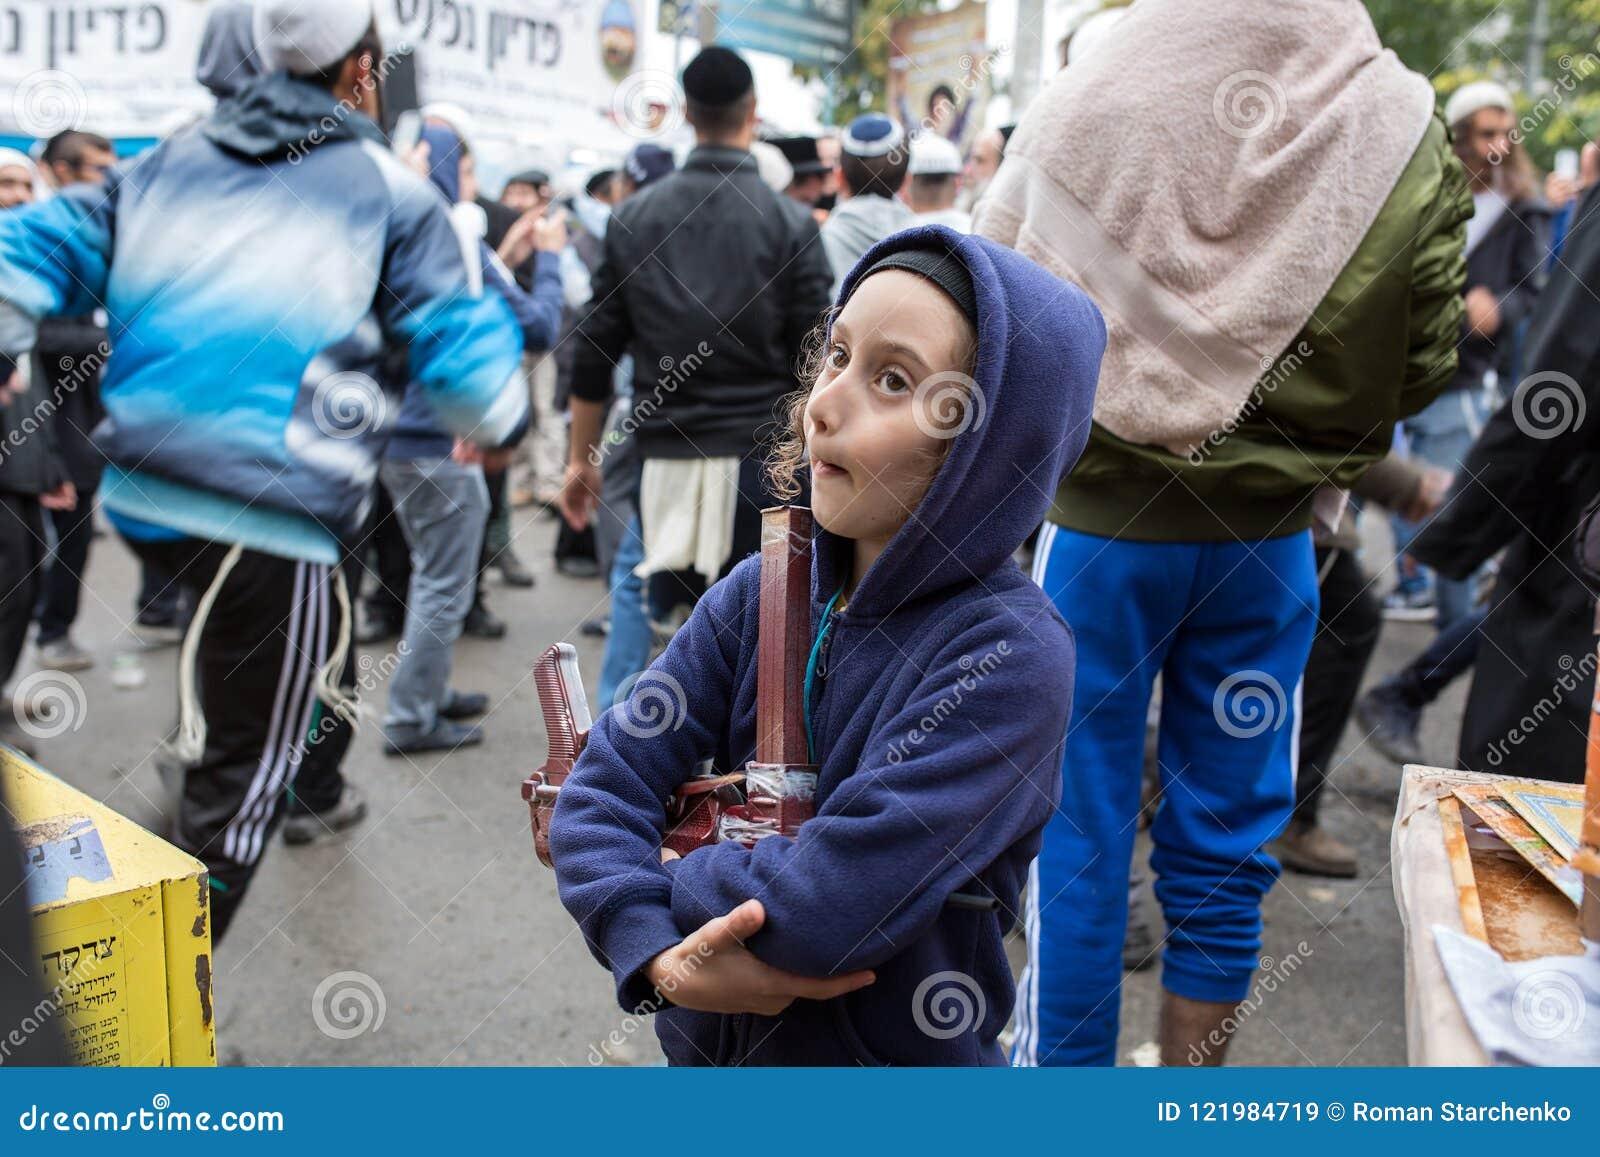 Uman, Ουκρανία, 13 09 2015: Ένα εβραϊκό αγόρι με Payots στο hoodie είναι η οδός, στο υπόβαθρο υπάρχουν πολλοί Εβραίοι